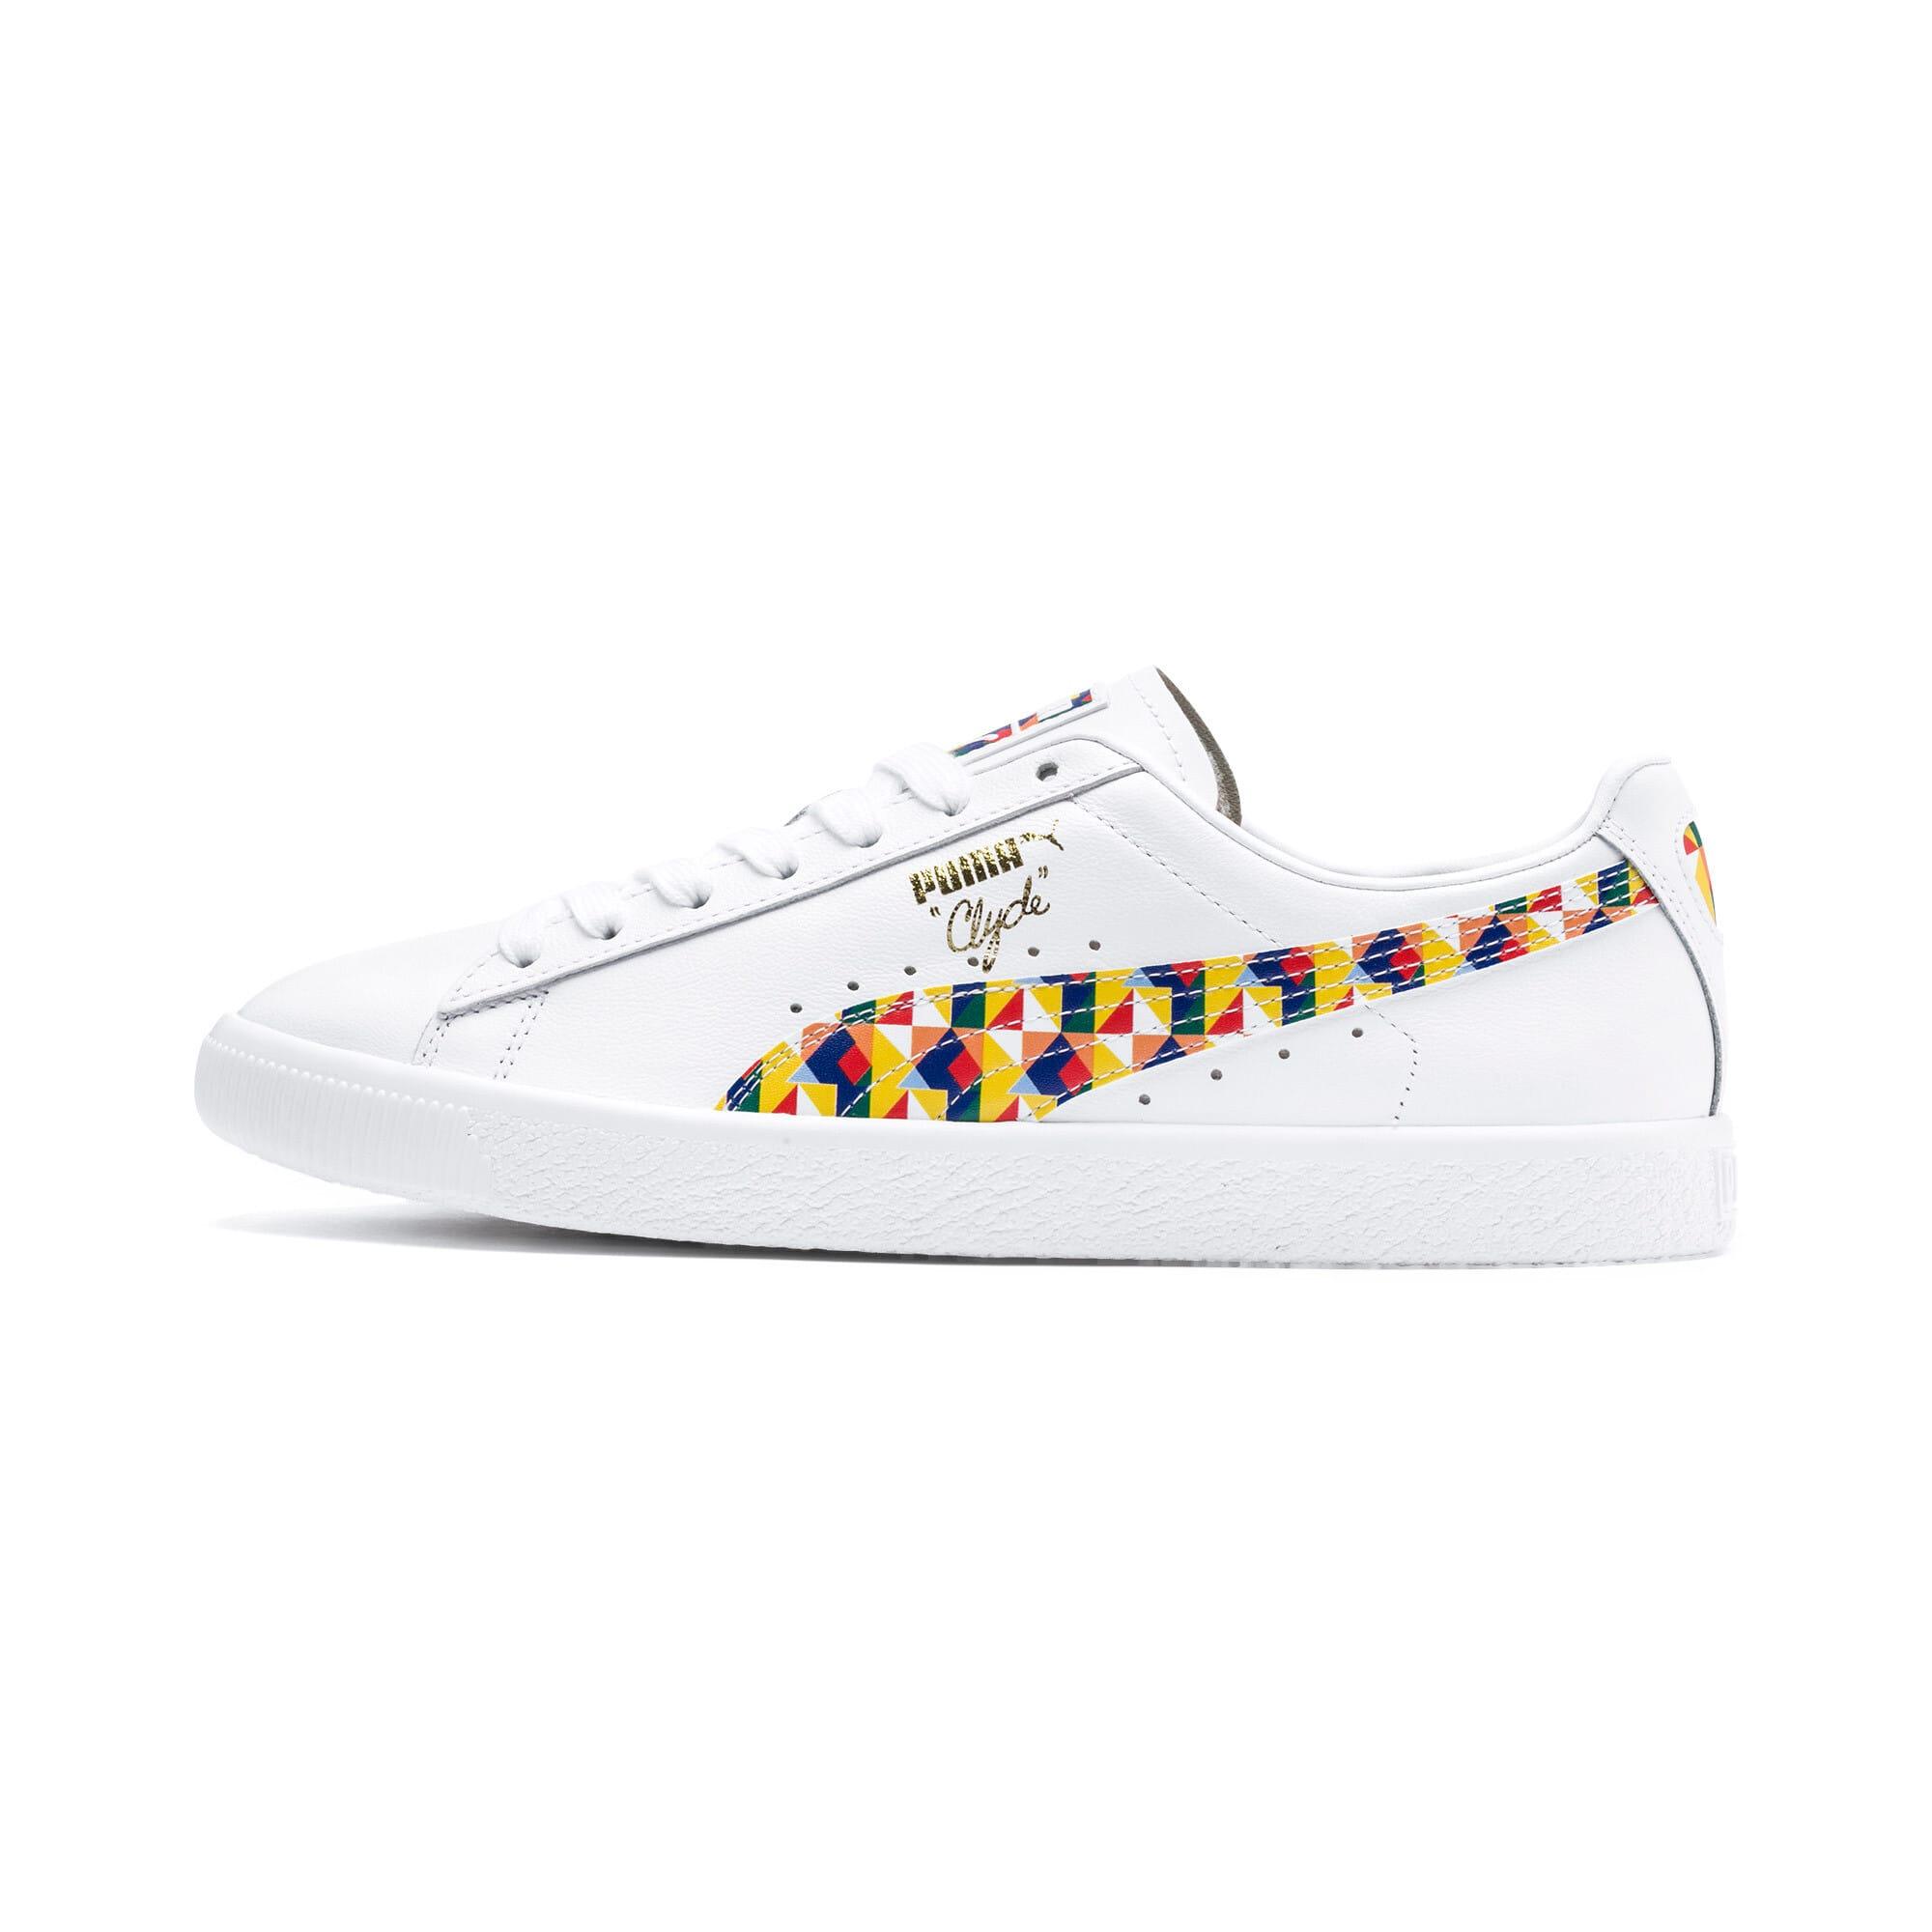 Thumbnail 1 of Clyde Graffiti Sneakers, Puma Wht-Dandelion-Puma Wht, medium